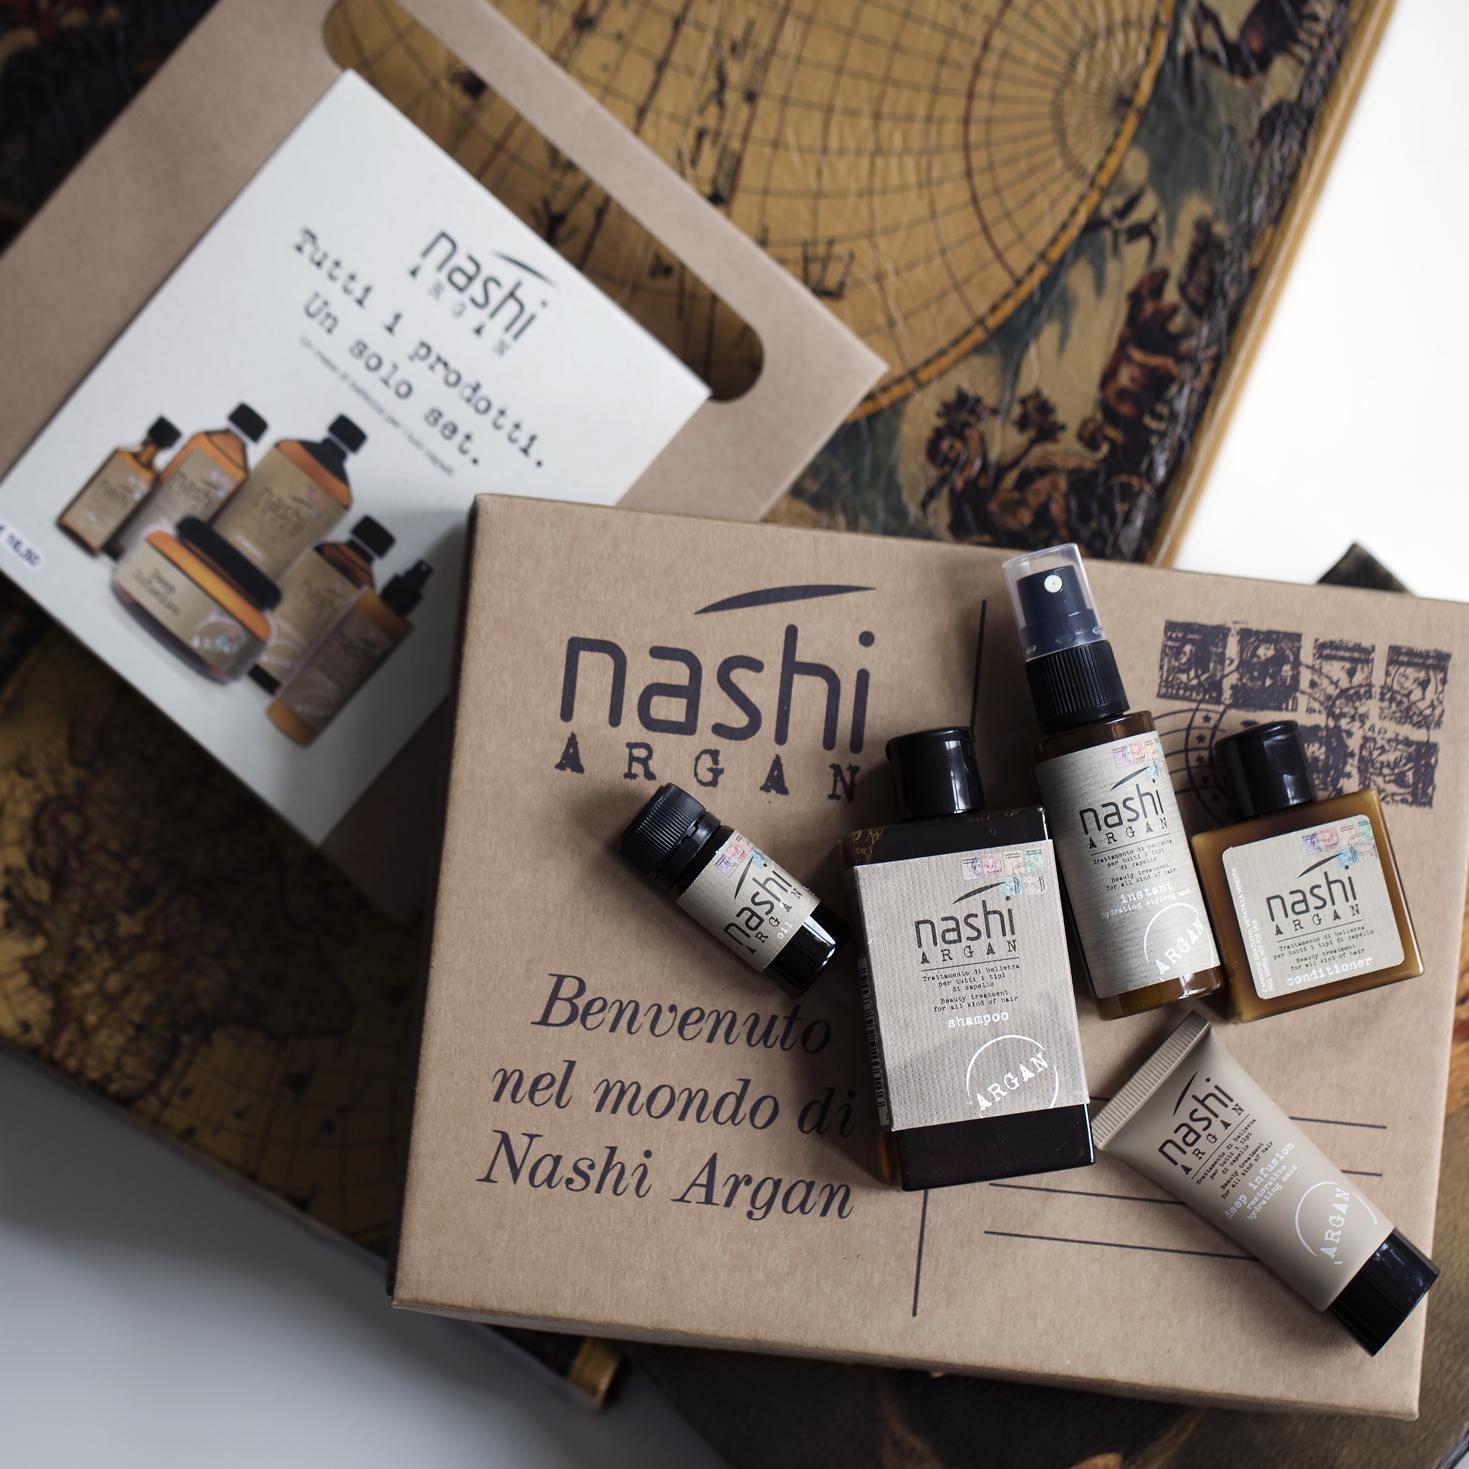 Nashi Argan Shop Online Unknow10